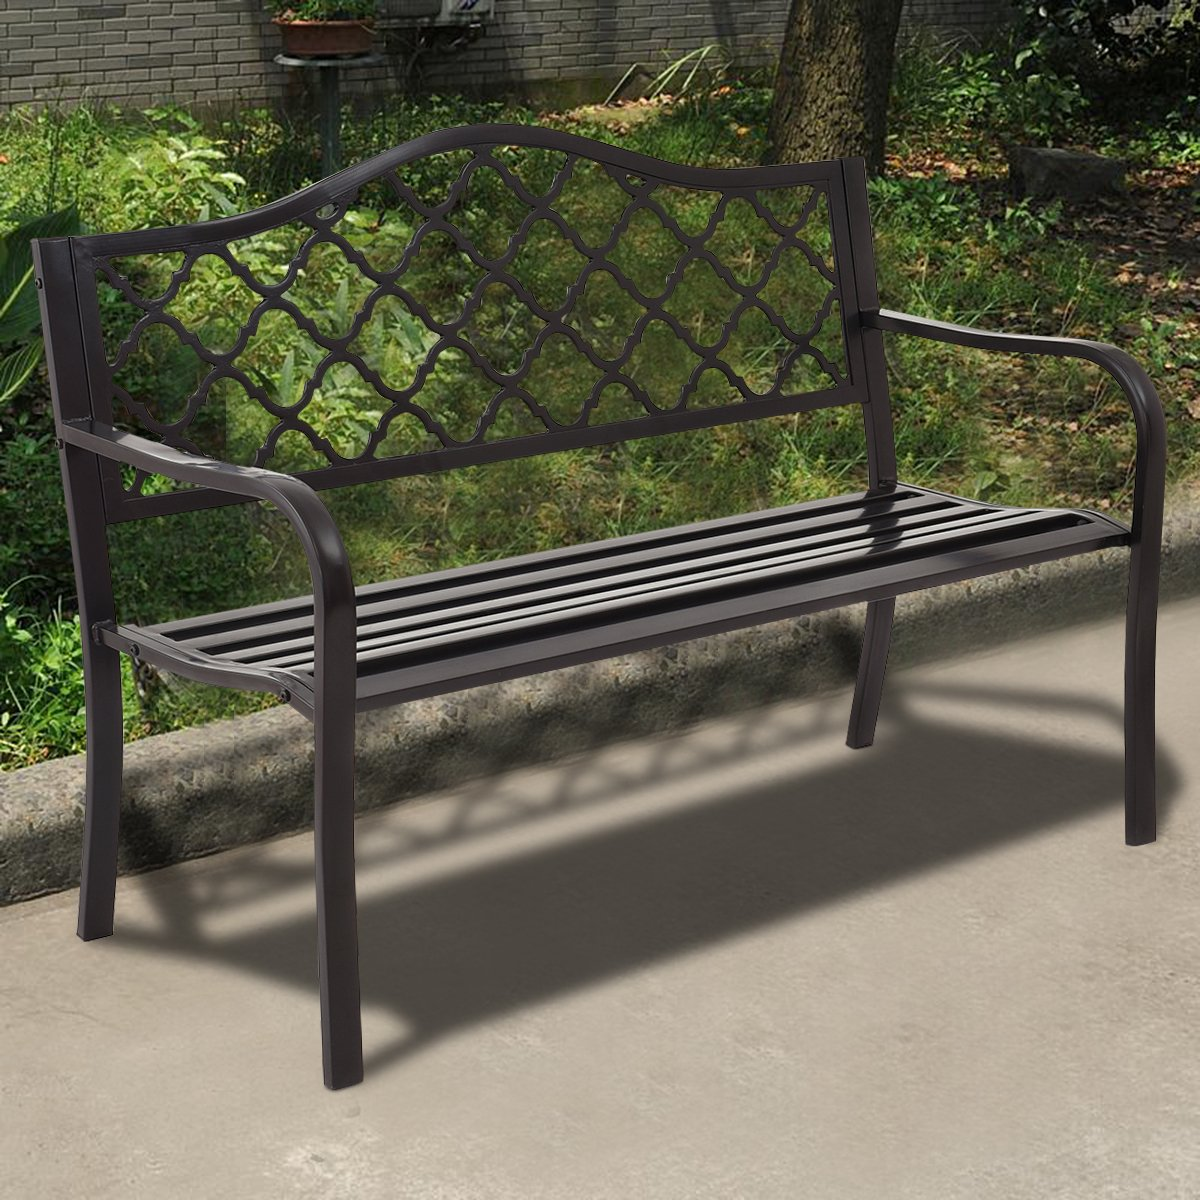 Giantex 50'' Patio Garden Bench Loveseats Park Yard Furniture Decor Cast Iron Frame Black (Black Style 1) by Giantex (Image #2)